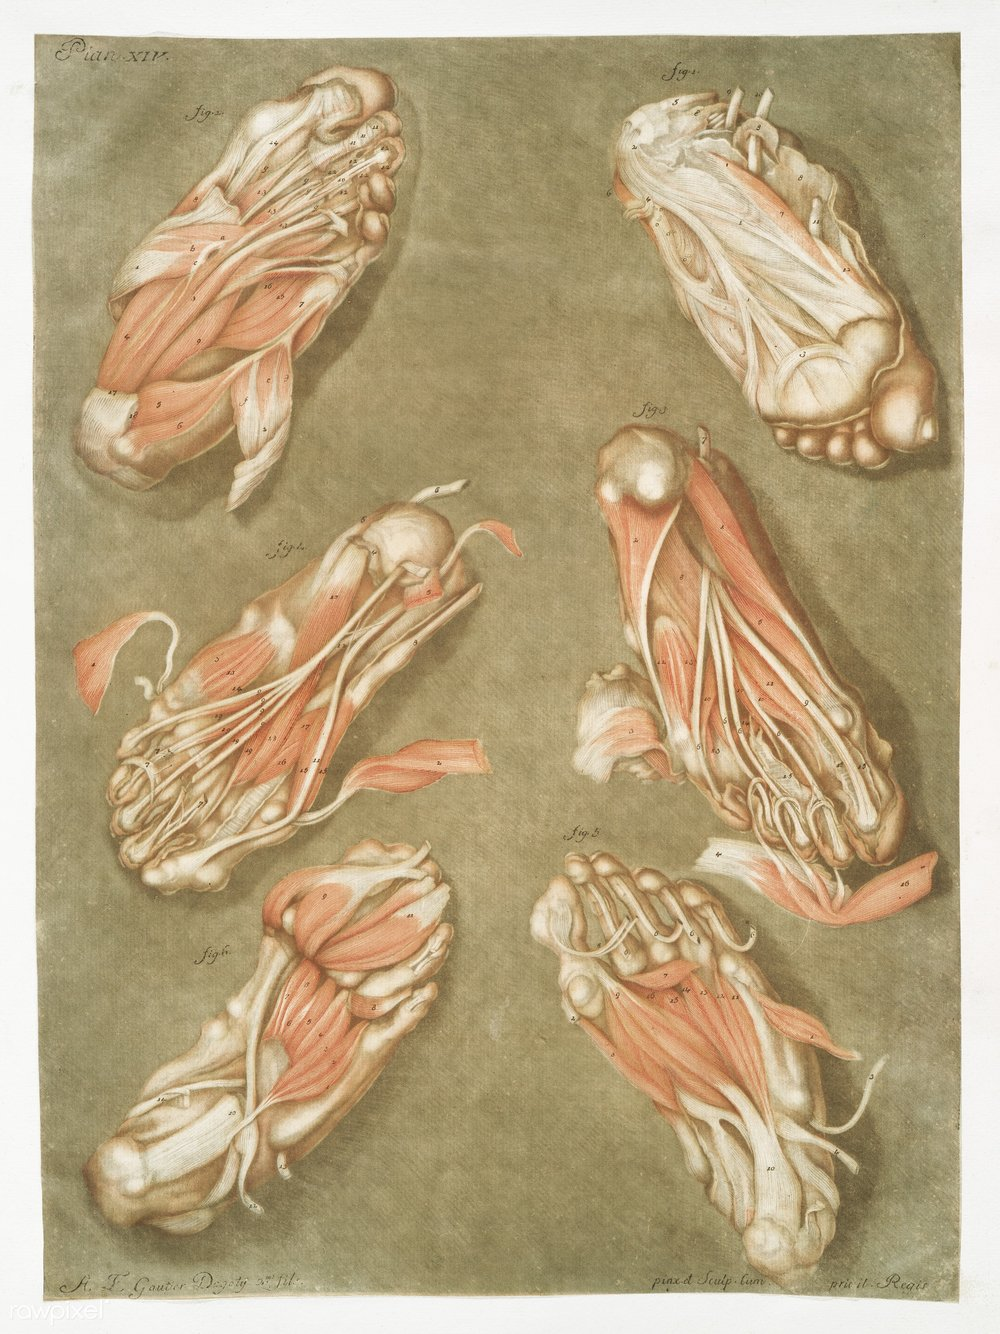 ARTIST -ARNAULD-ELOI GAUTIER-DAGOTY (1741-1771)